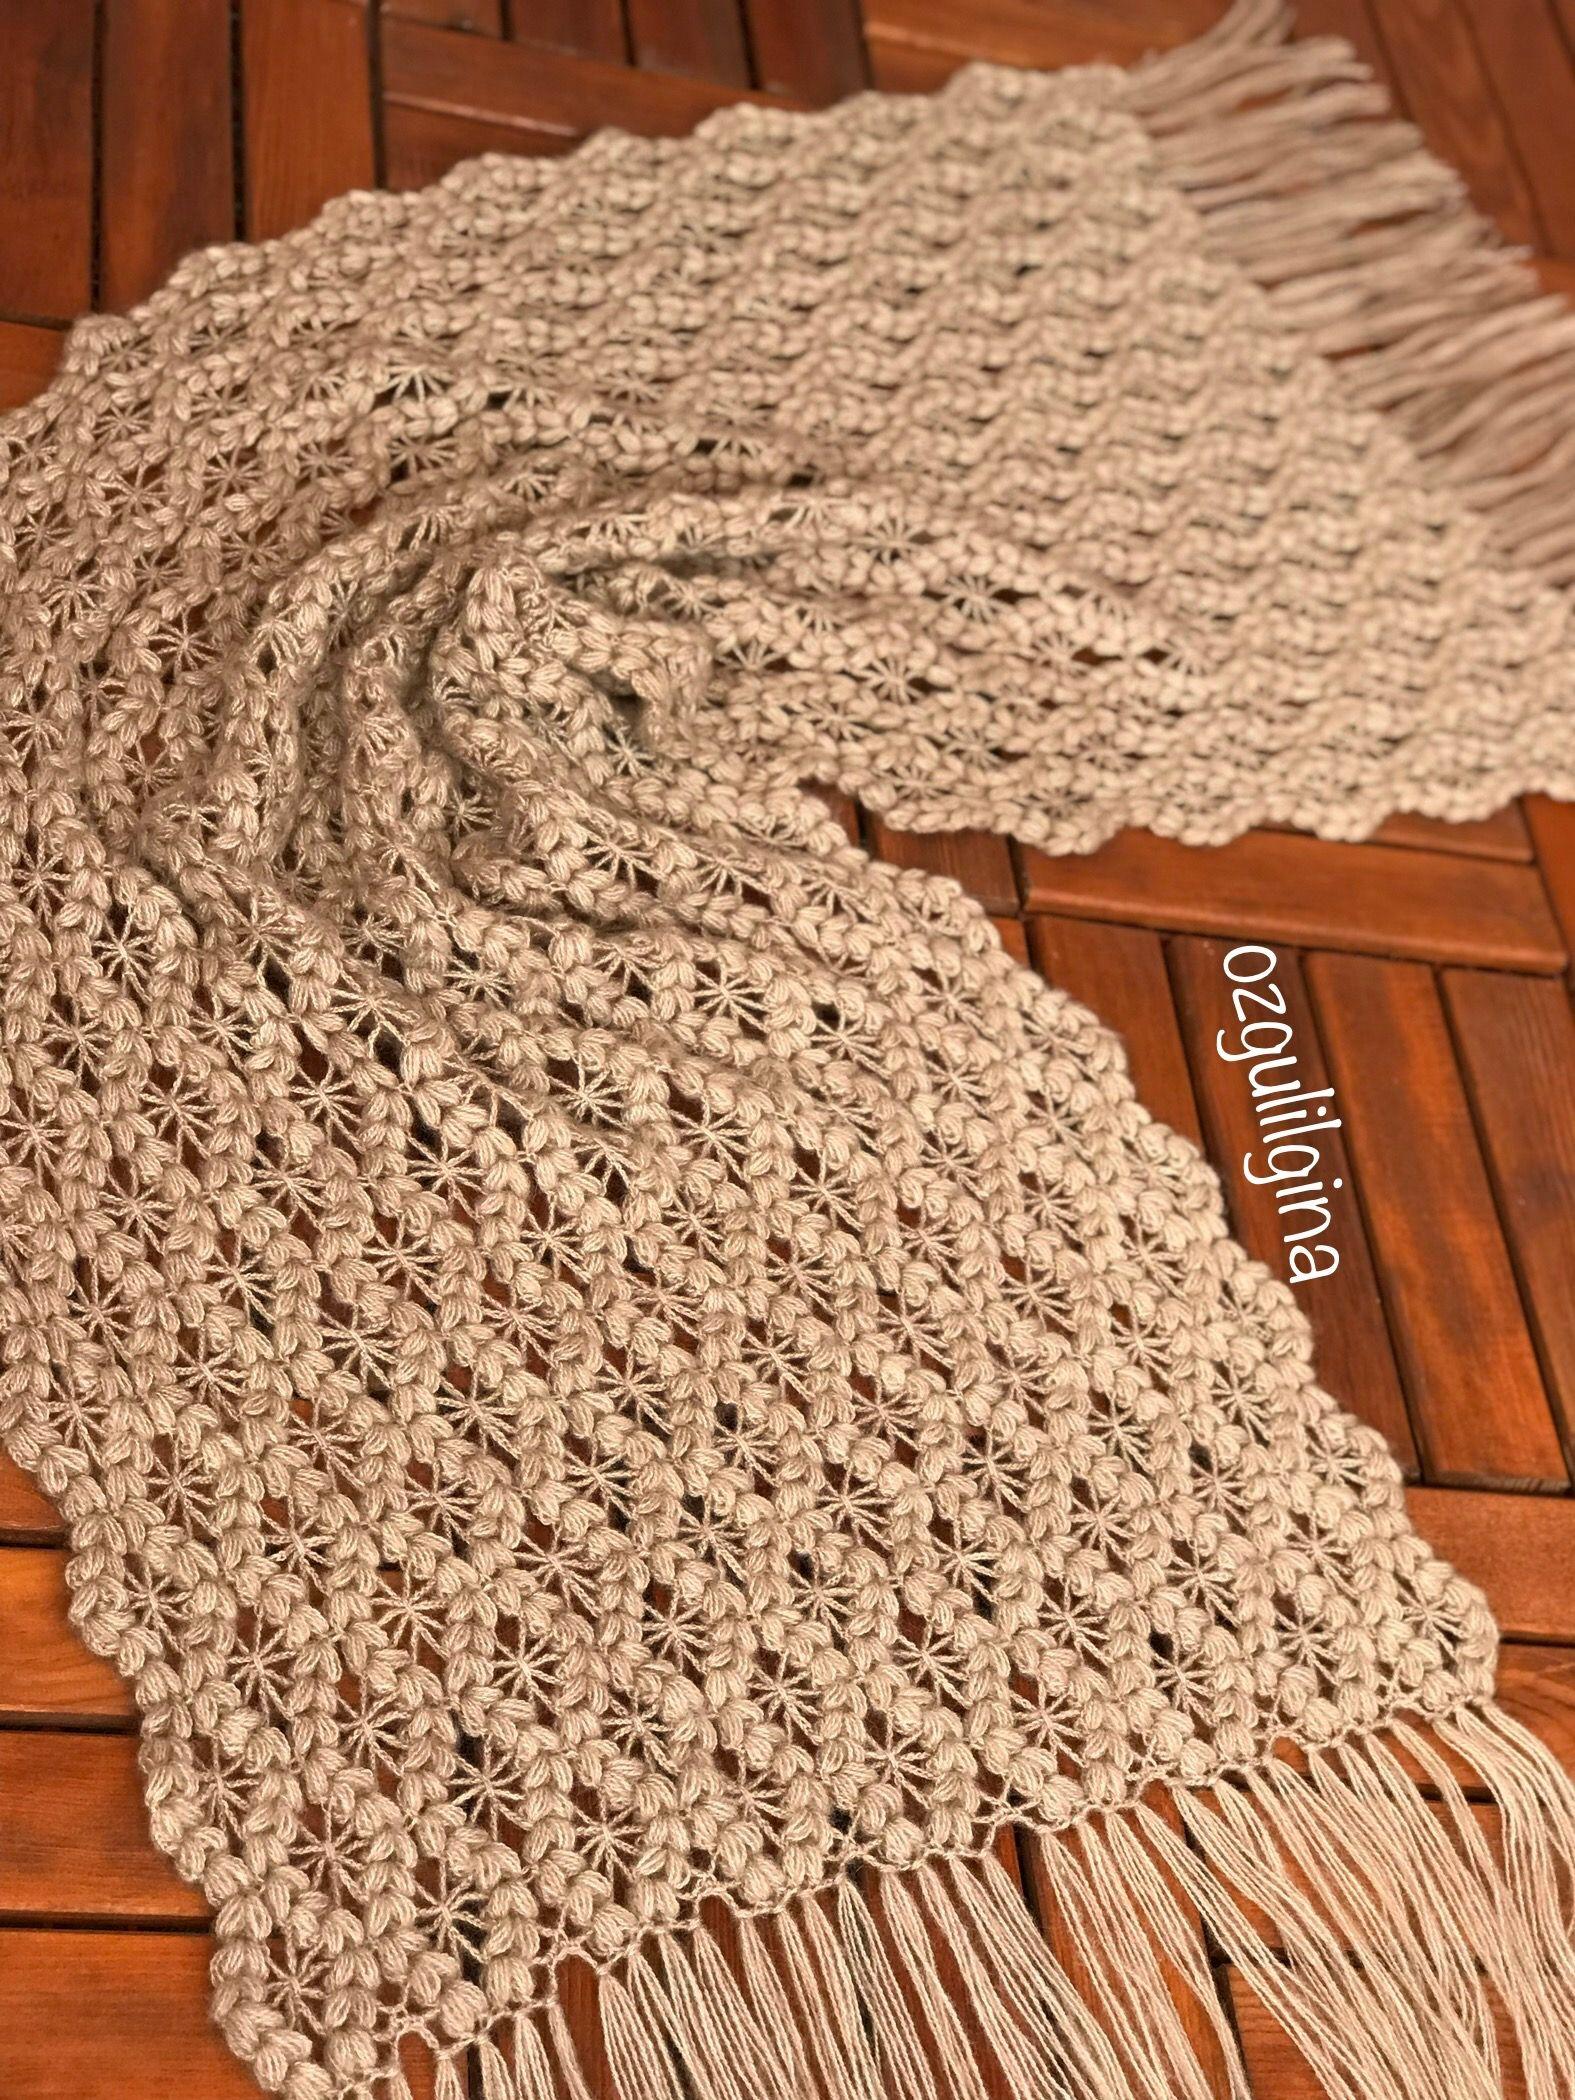 Orgumuseviyorum Hobi Elemegi Elemegigoznuru Crochet Crochetlove Knitting Knit Knittinglove Knittingyarn Shawl Inst Sal Tig Isleri Orgu Modelleri